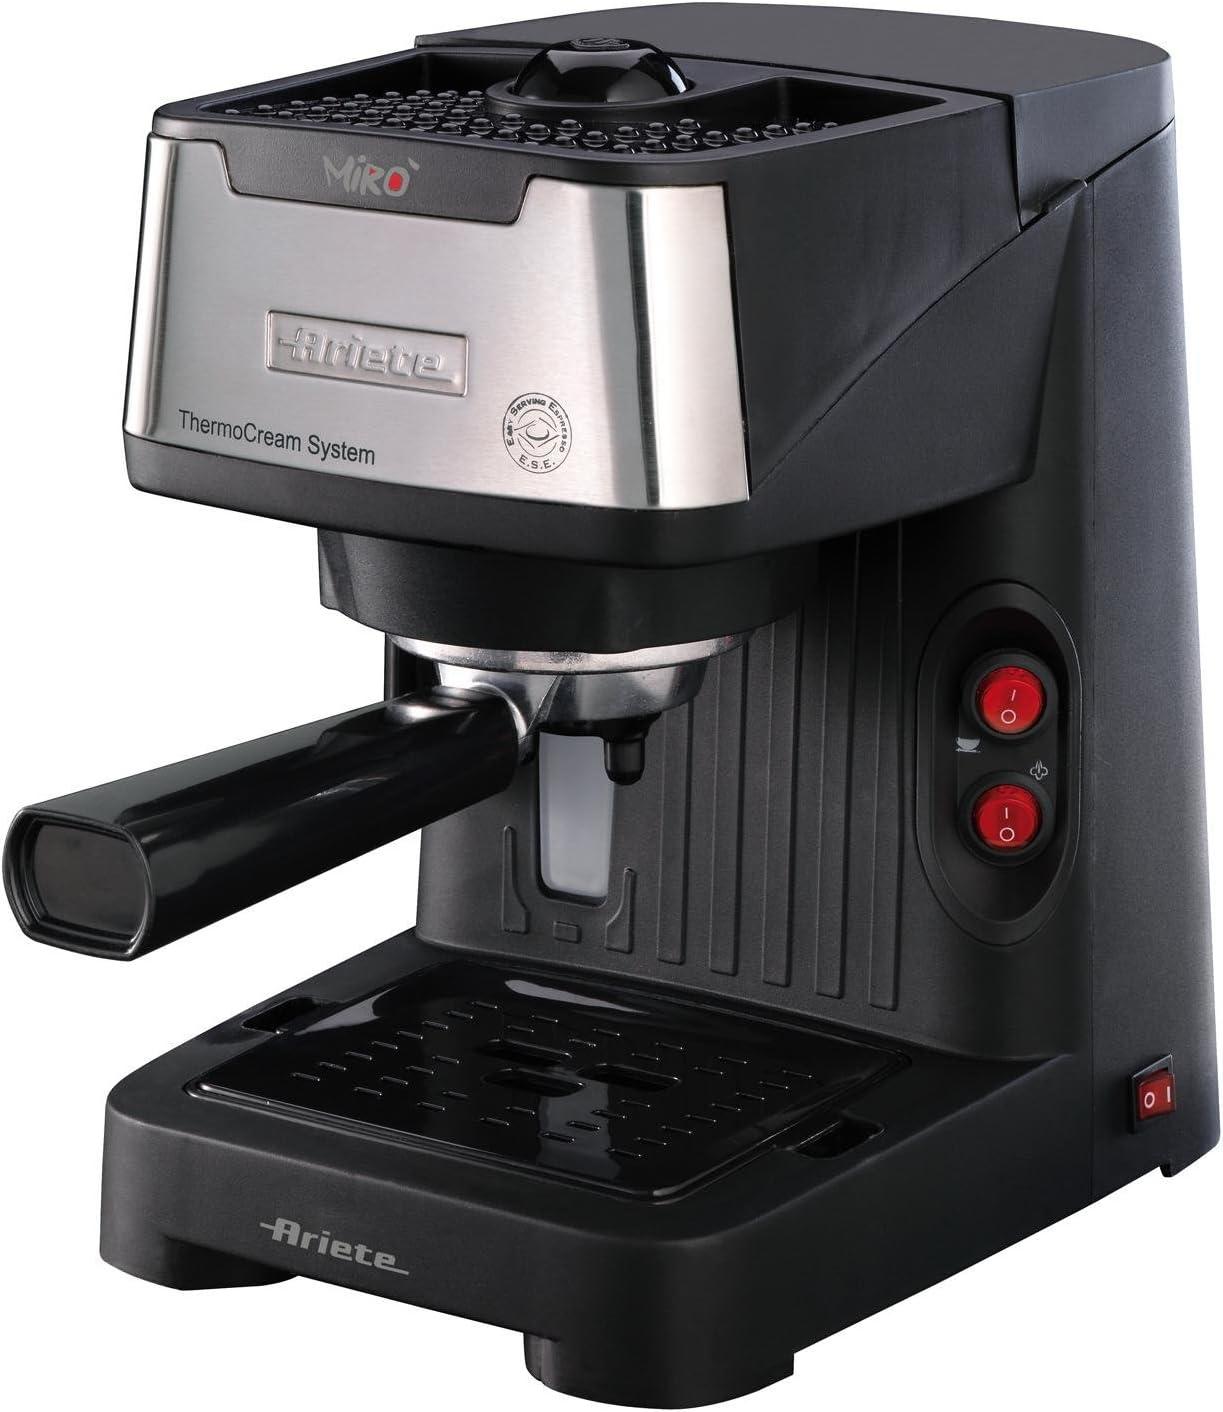 Ariete 00 m133950ar0 Miró máquina de café: Amazon.es: Hogar